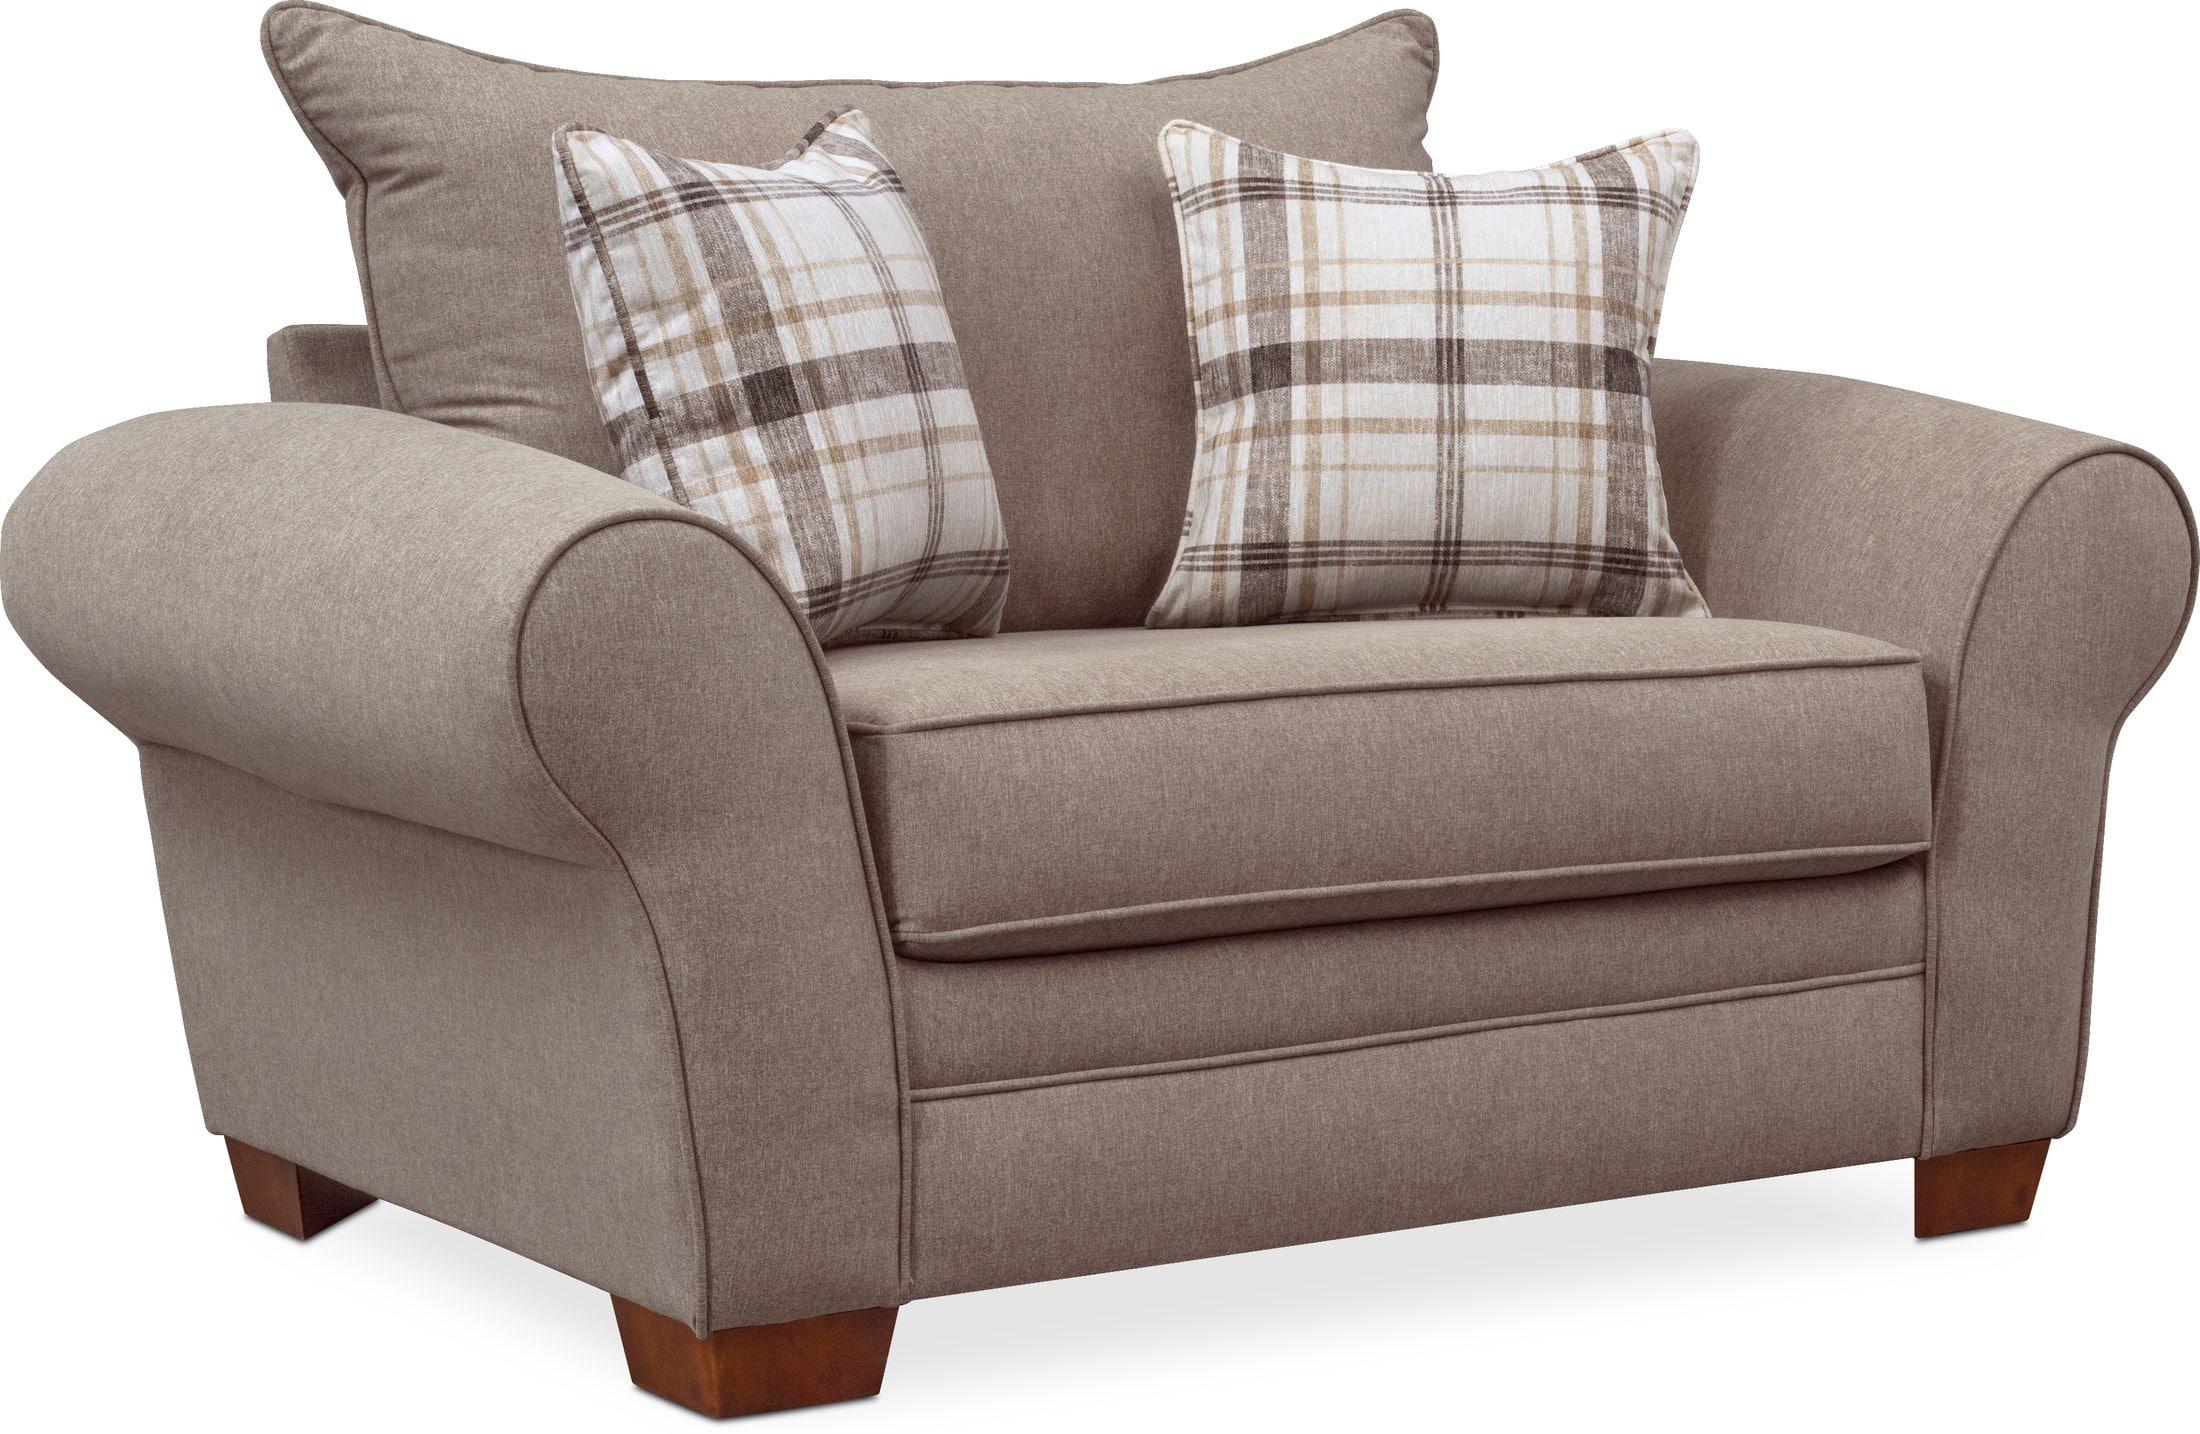 Living Room Furniture - Rowan Chair and a Half